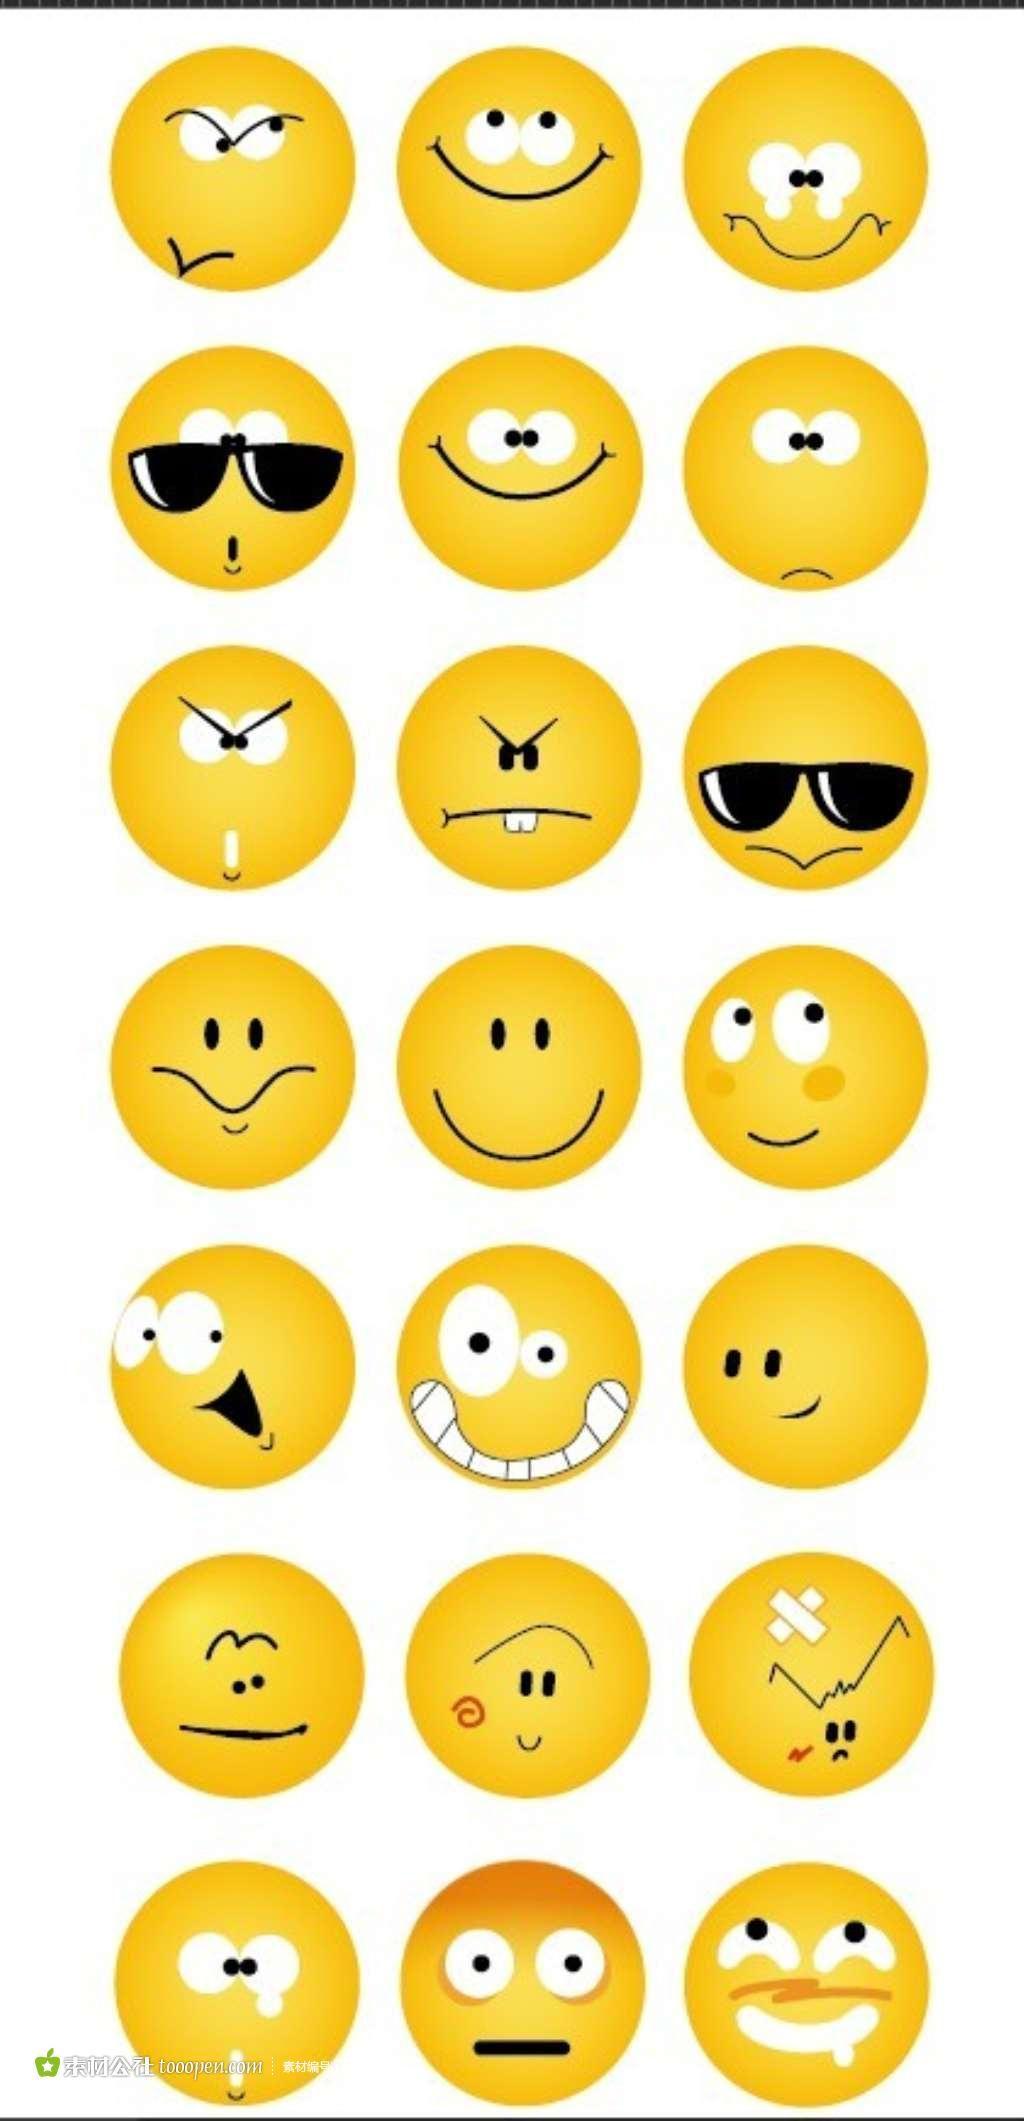 表情符號 ai - Google 搜尋 | Design